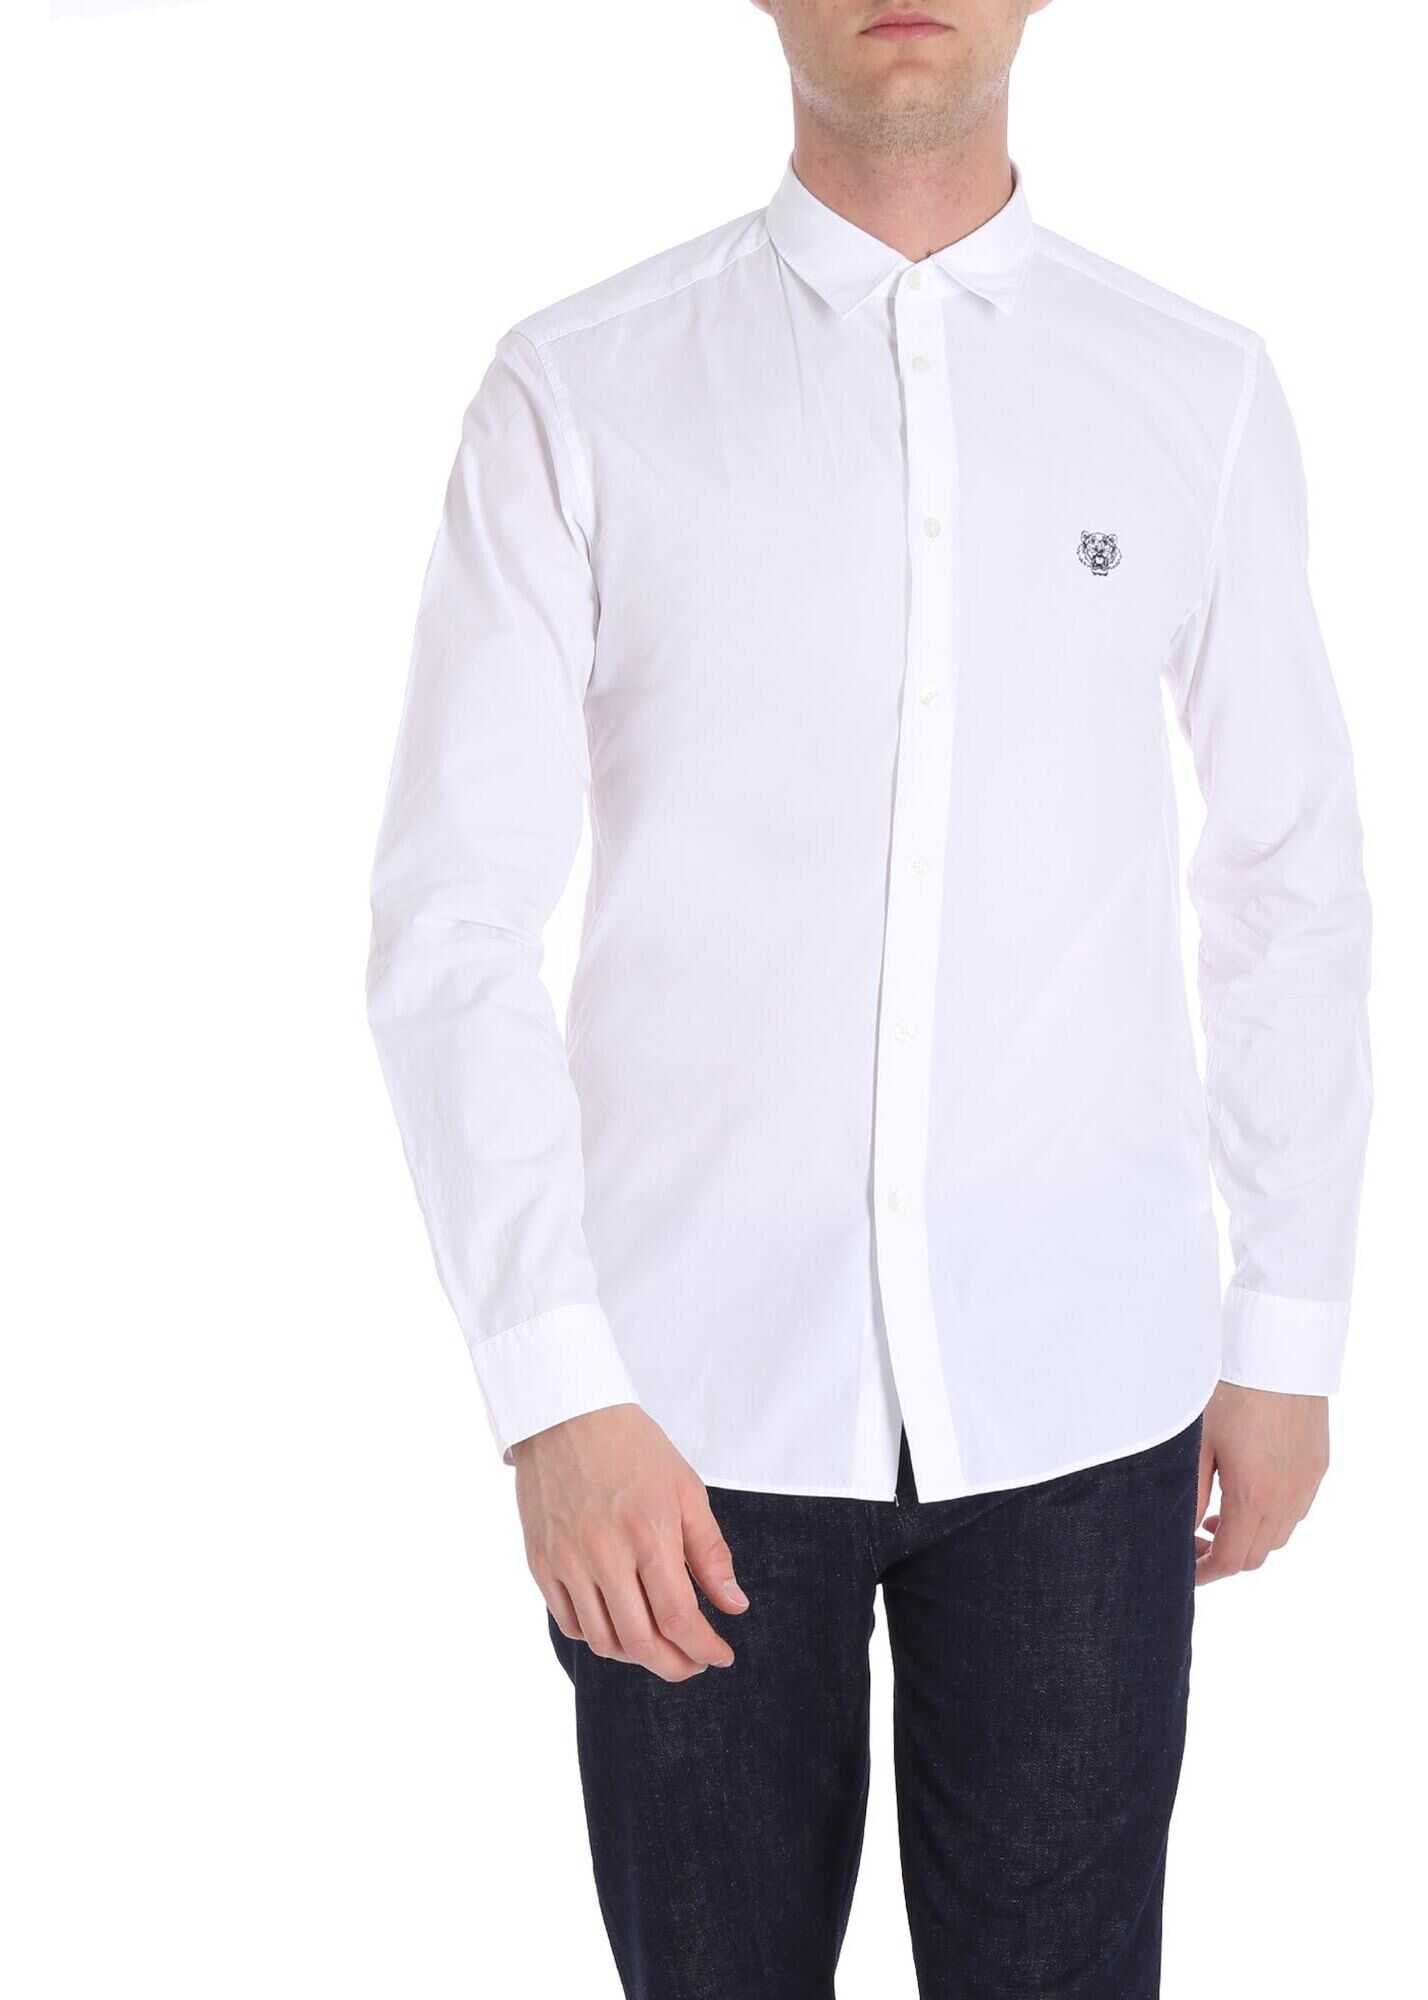 Kenzo White Urban Shirt White imagine